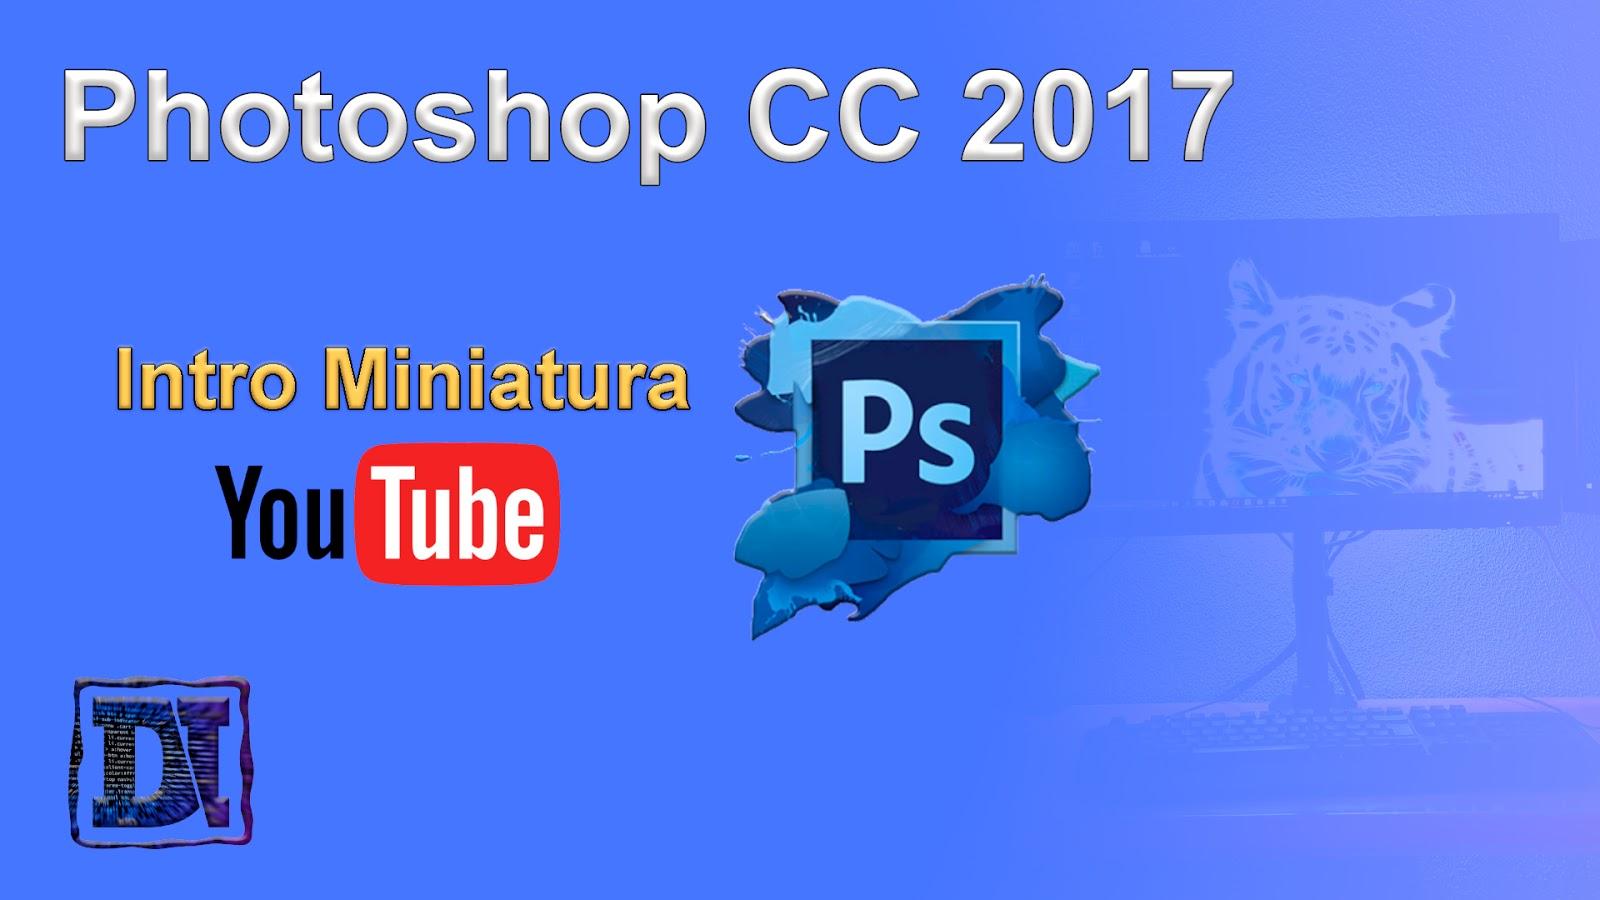 Miniaturas Photoshop Cc 2017 Desastre Informatico